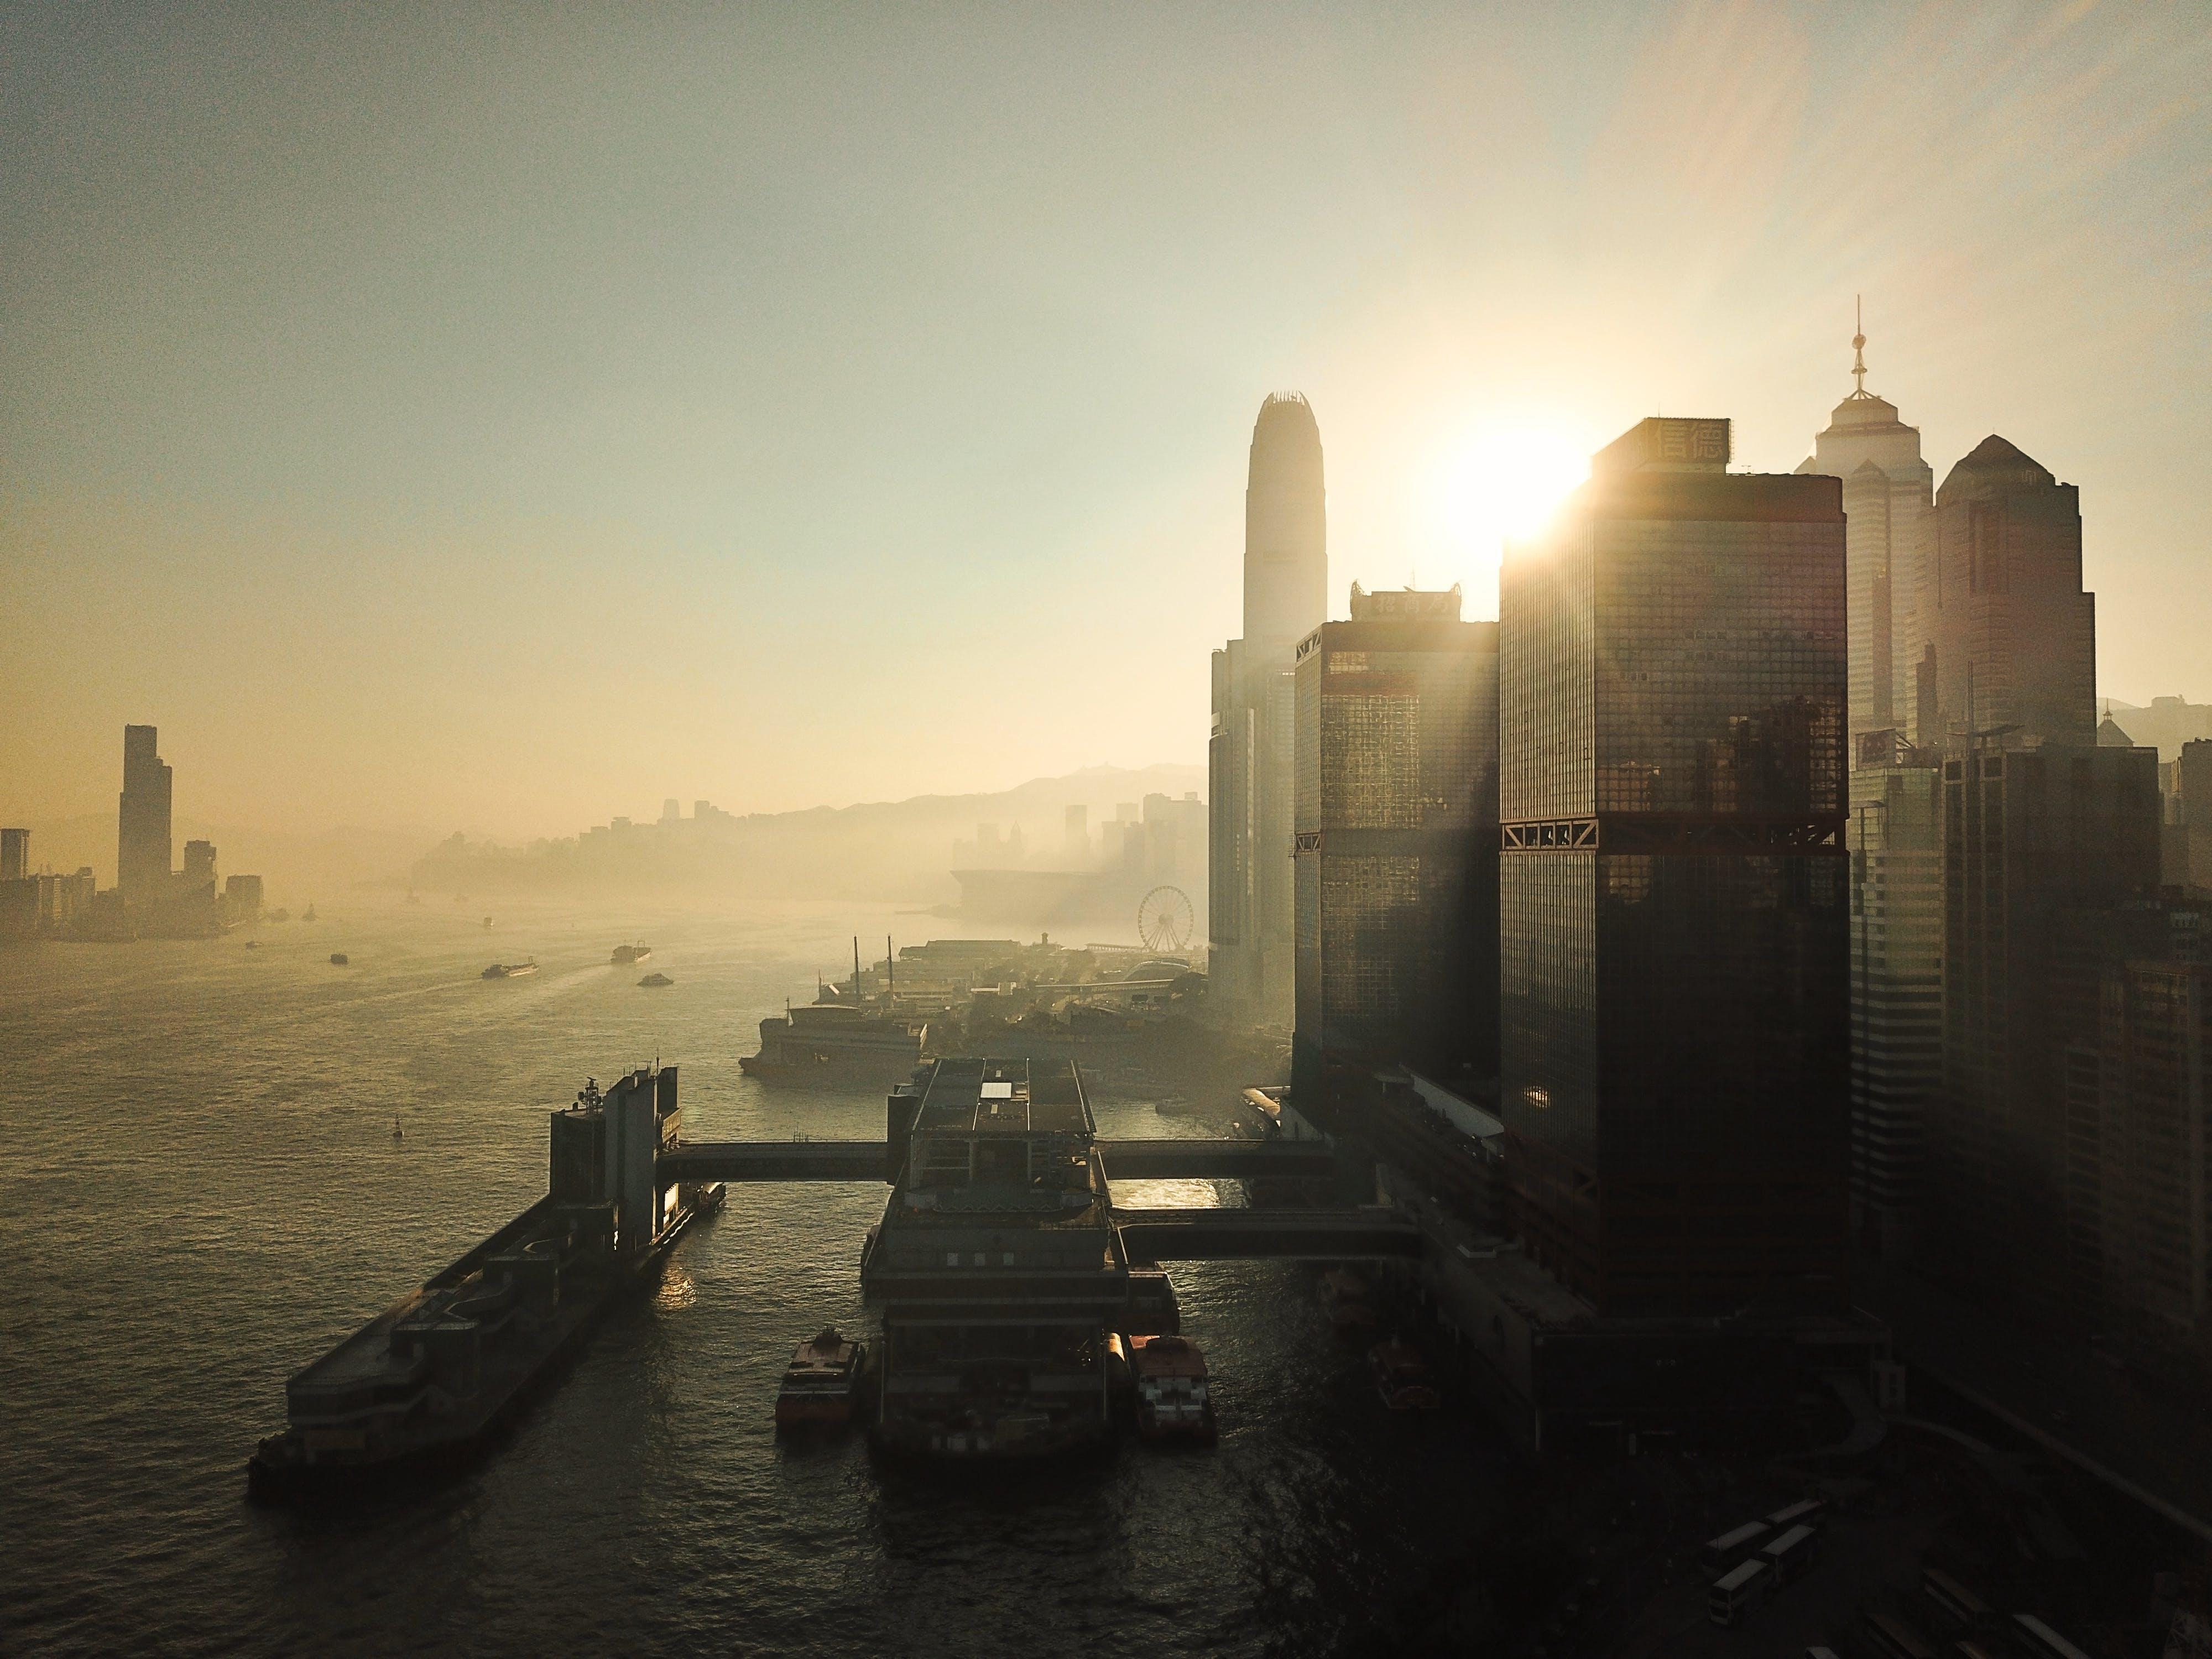 Free stock photo of city, skyscrapers, morning sun, hong kong